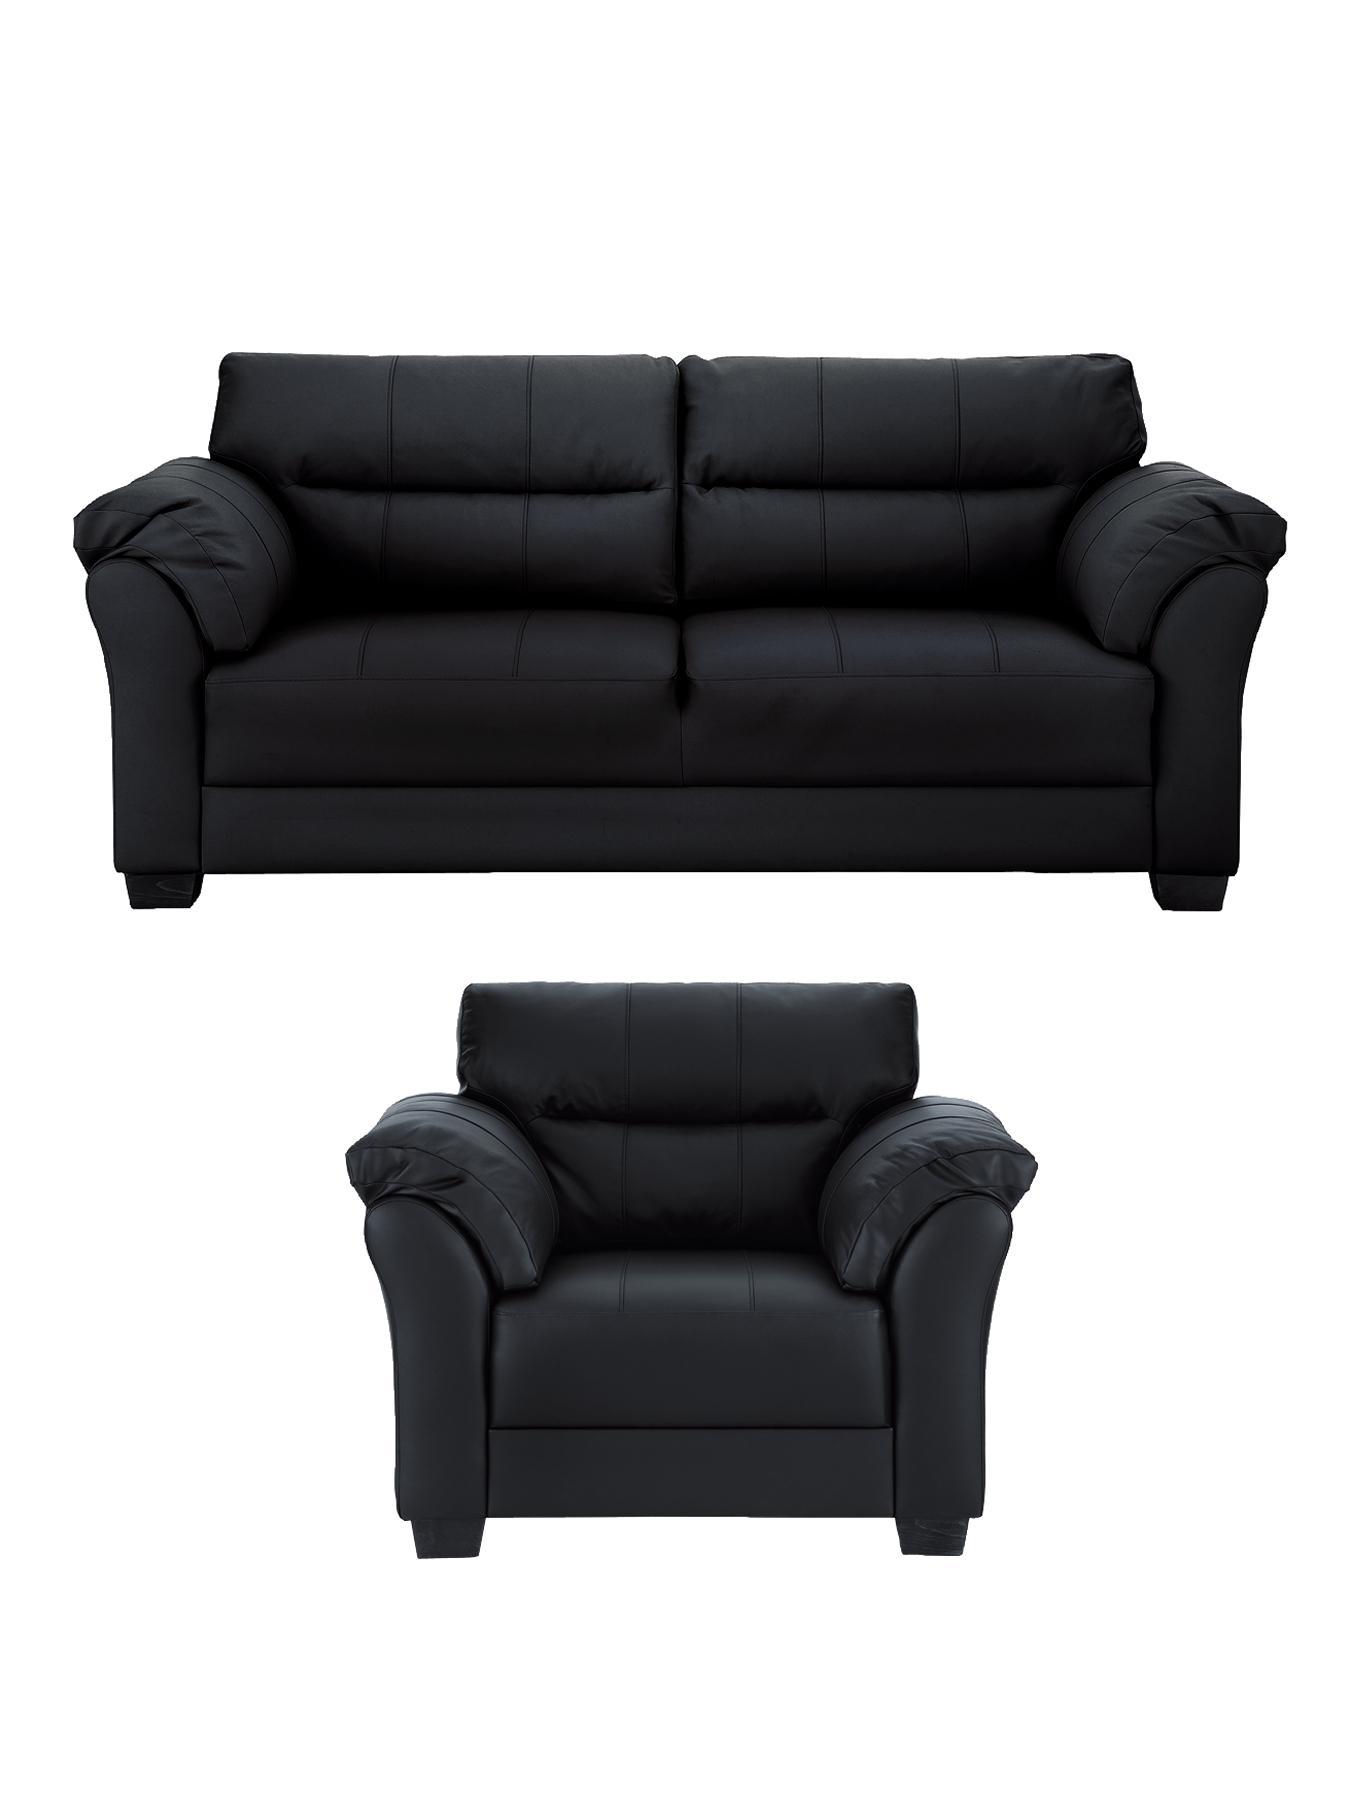 Marino 3-Seater Sofa plus FREE Armchair, Chocolate,Ivory,Black